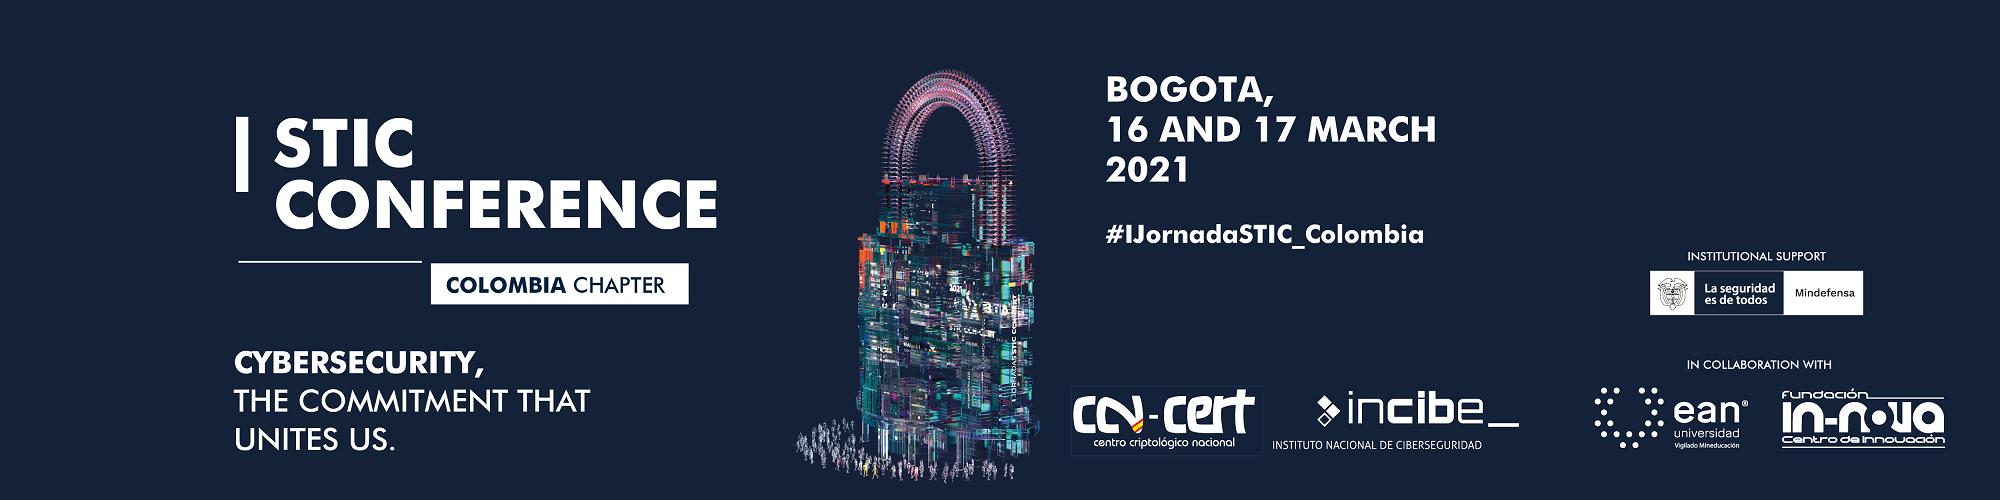 1-ijornadas_Colombia_banner-general-ene2021-INCIBE4-EN